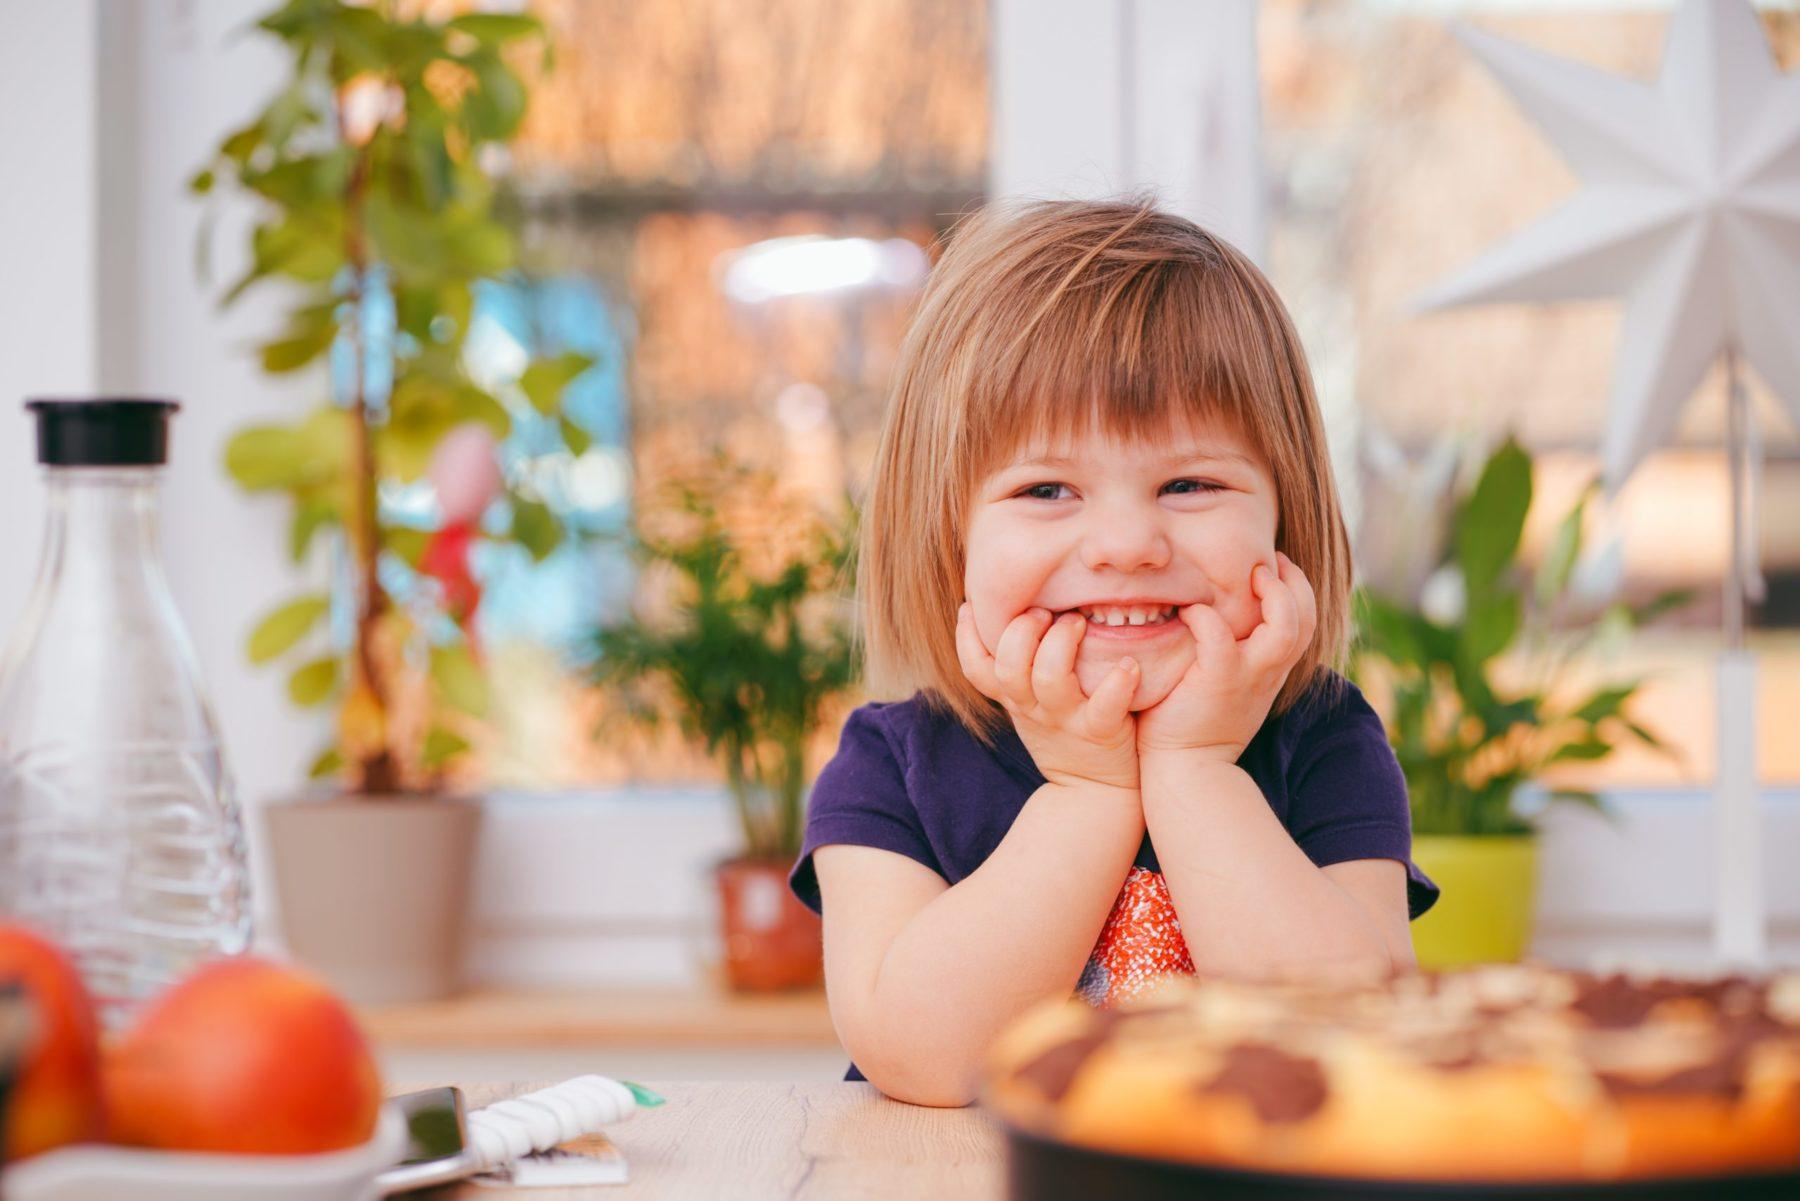 Children's Cooking Classes